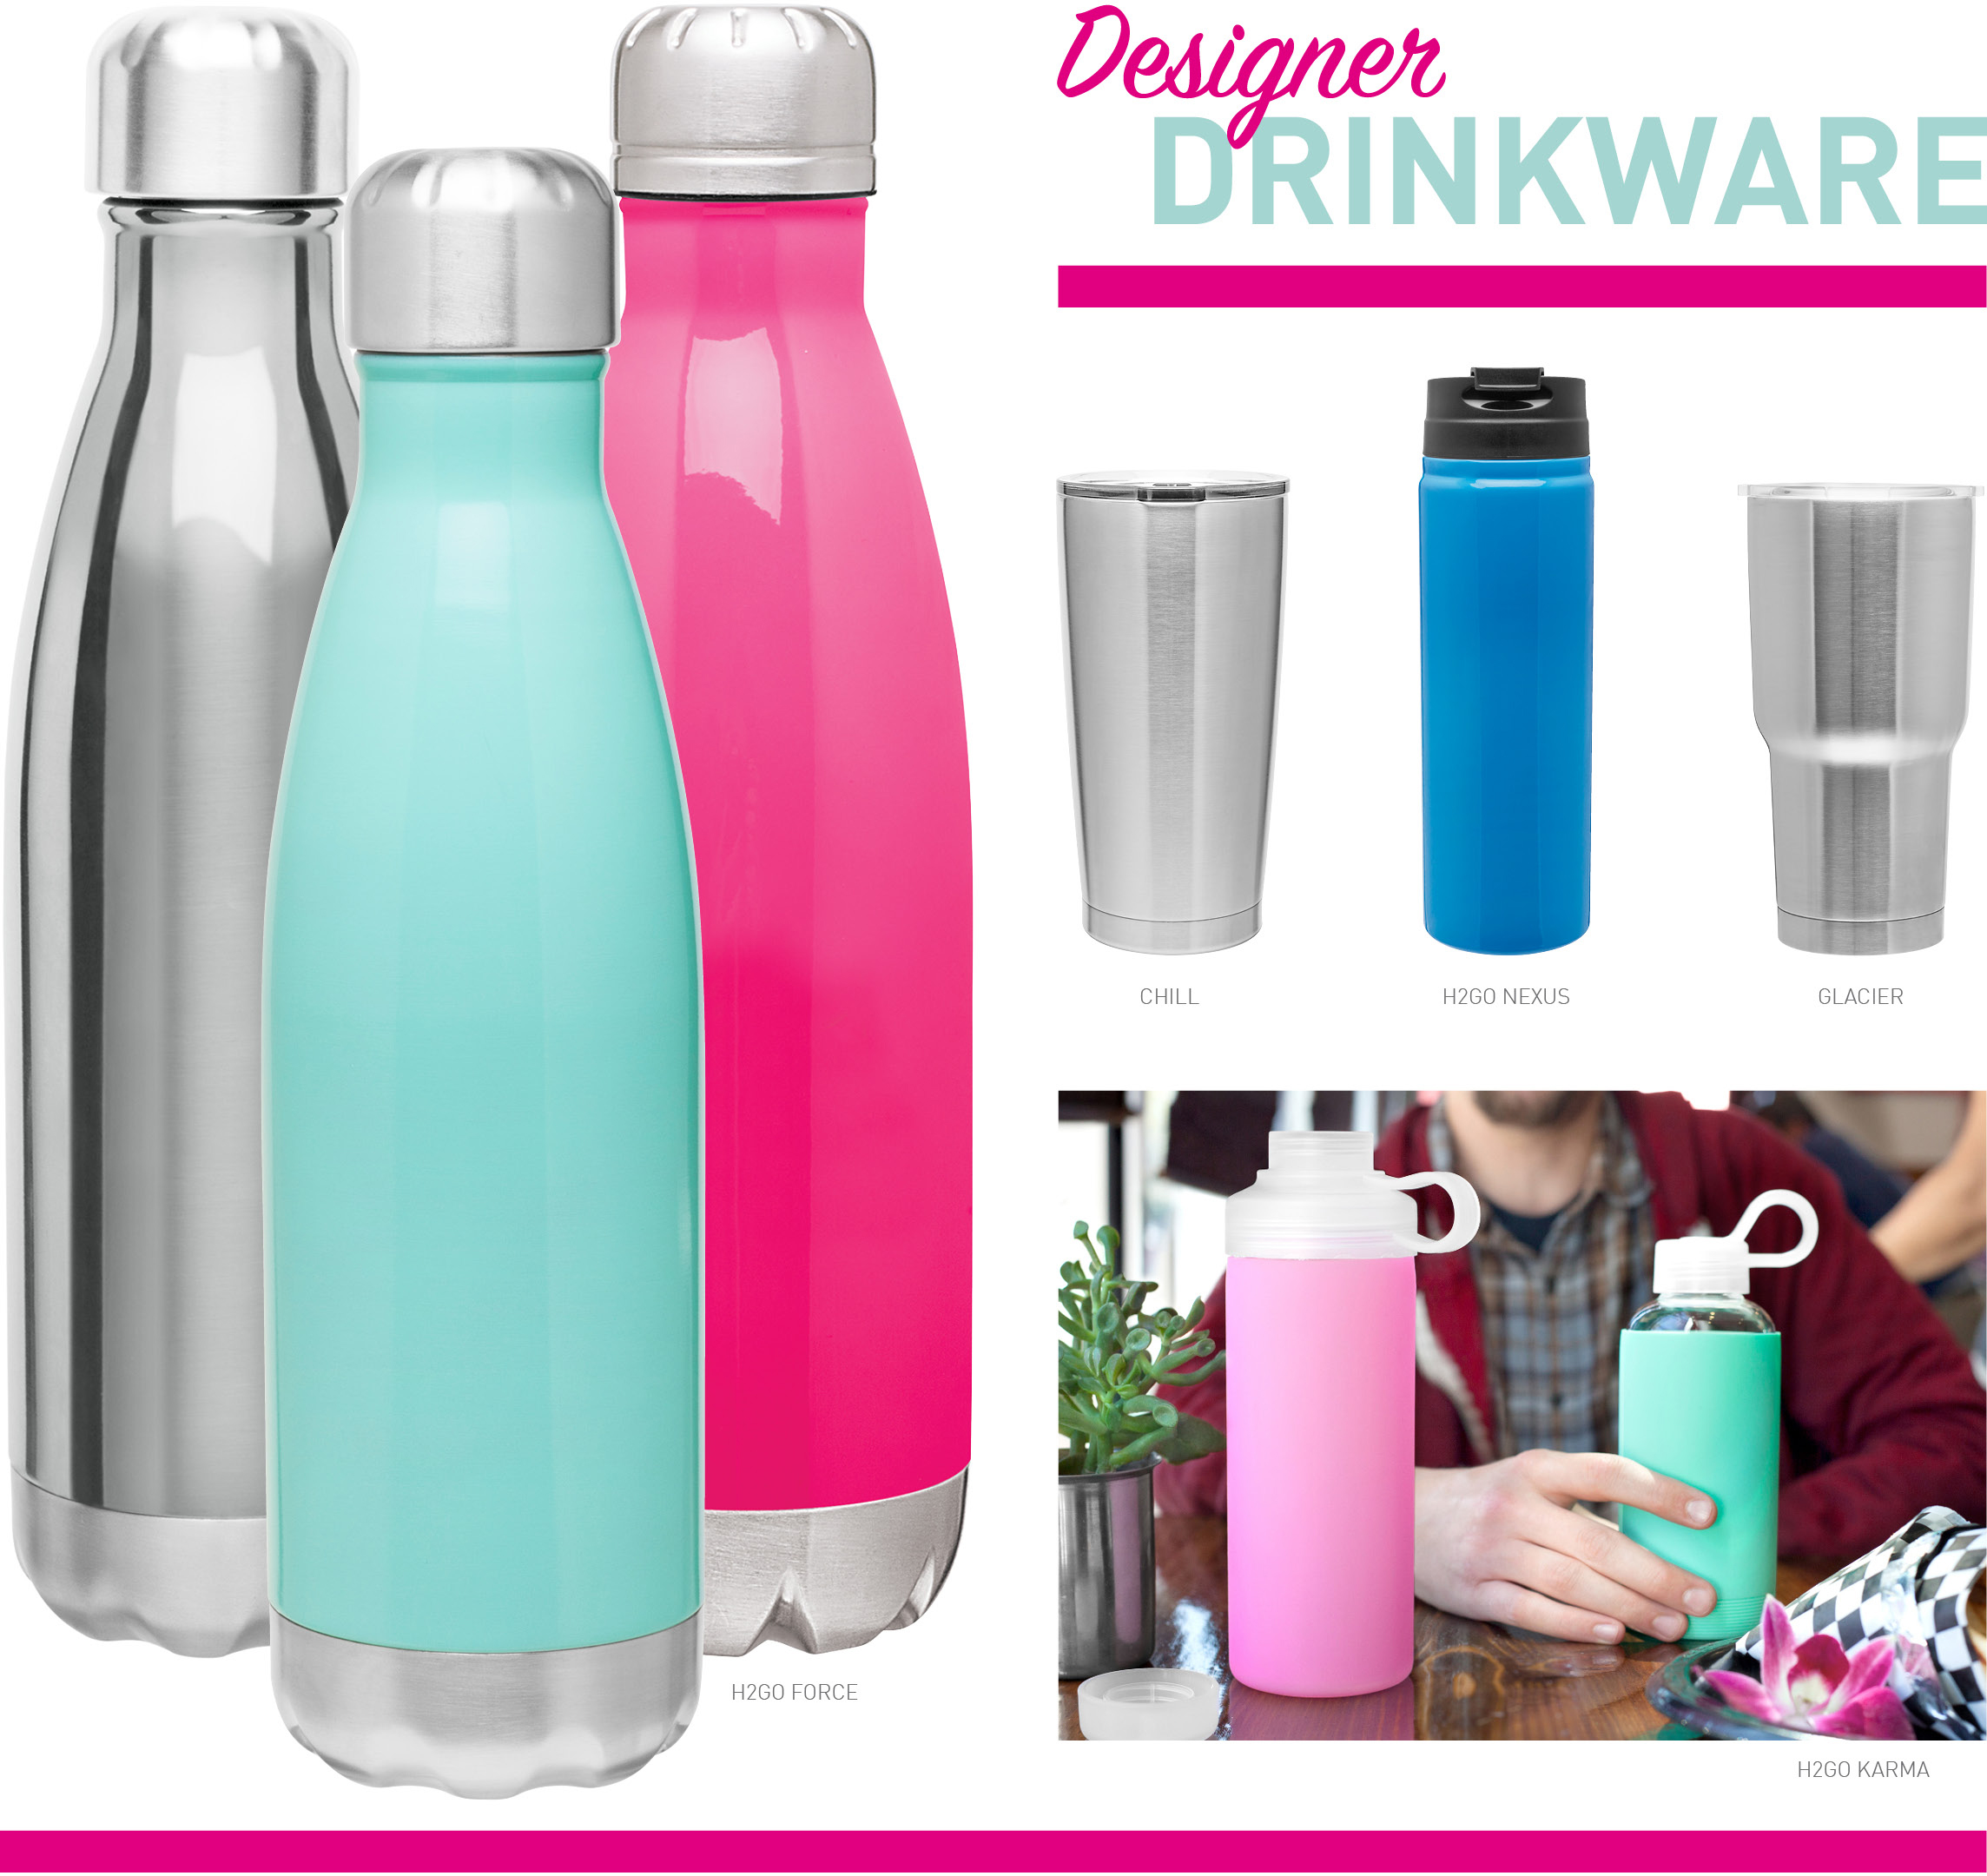 designerdrinkware.jpg